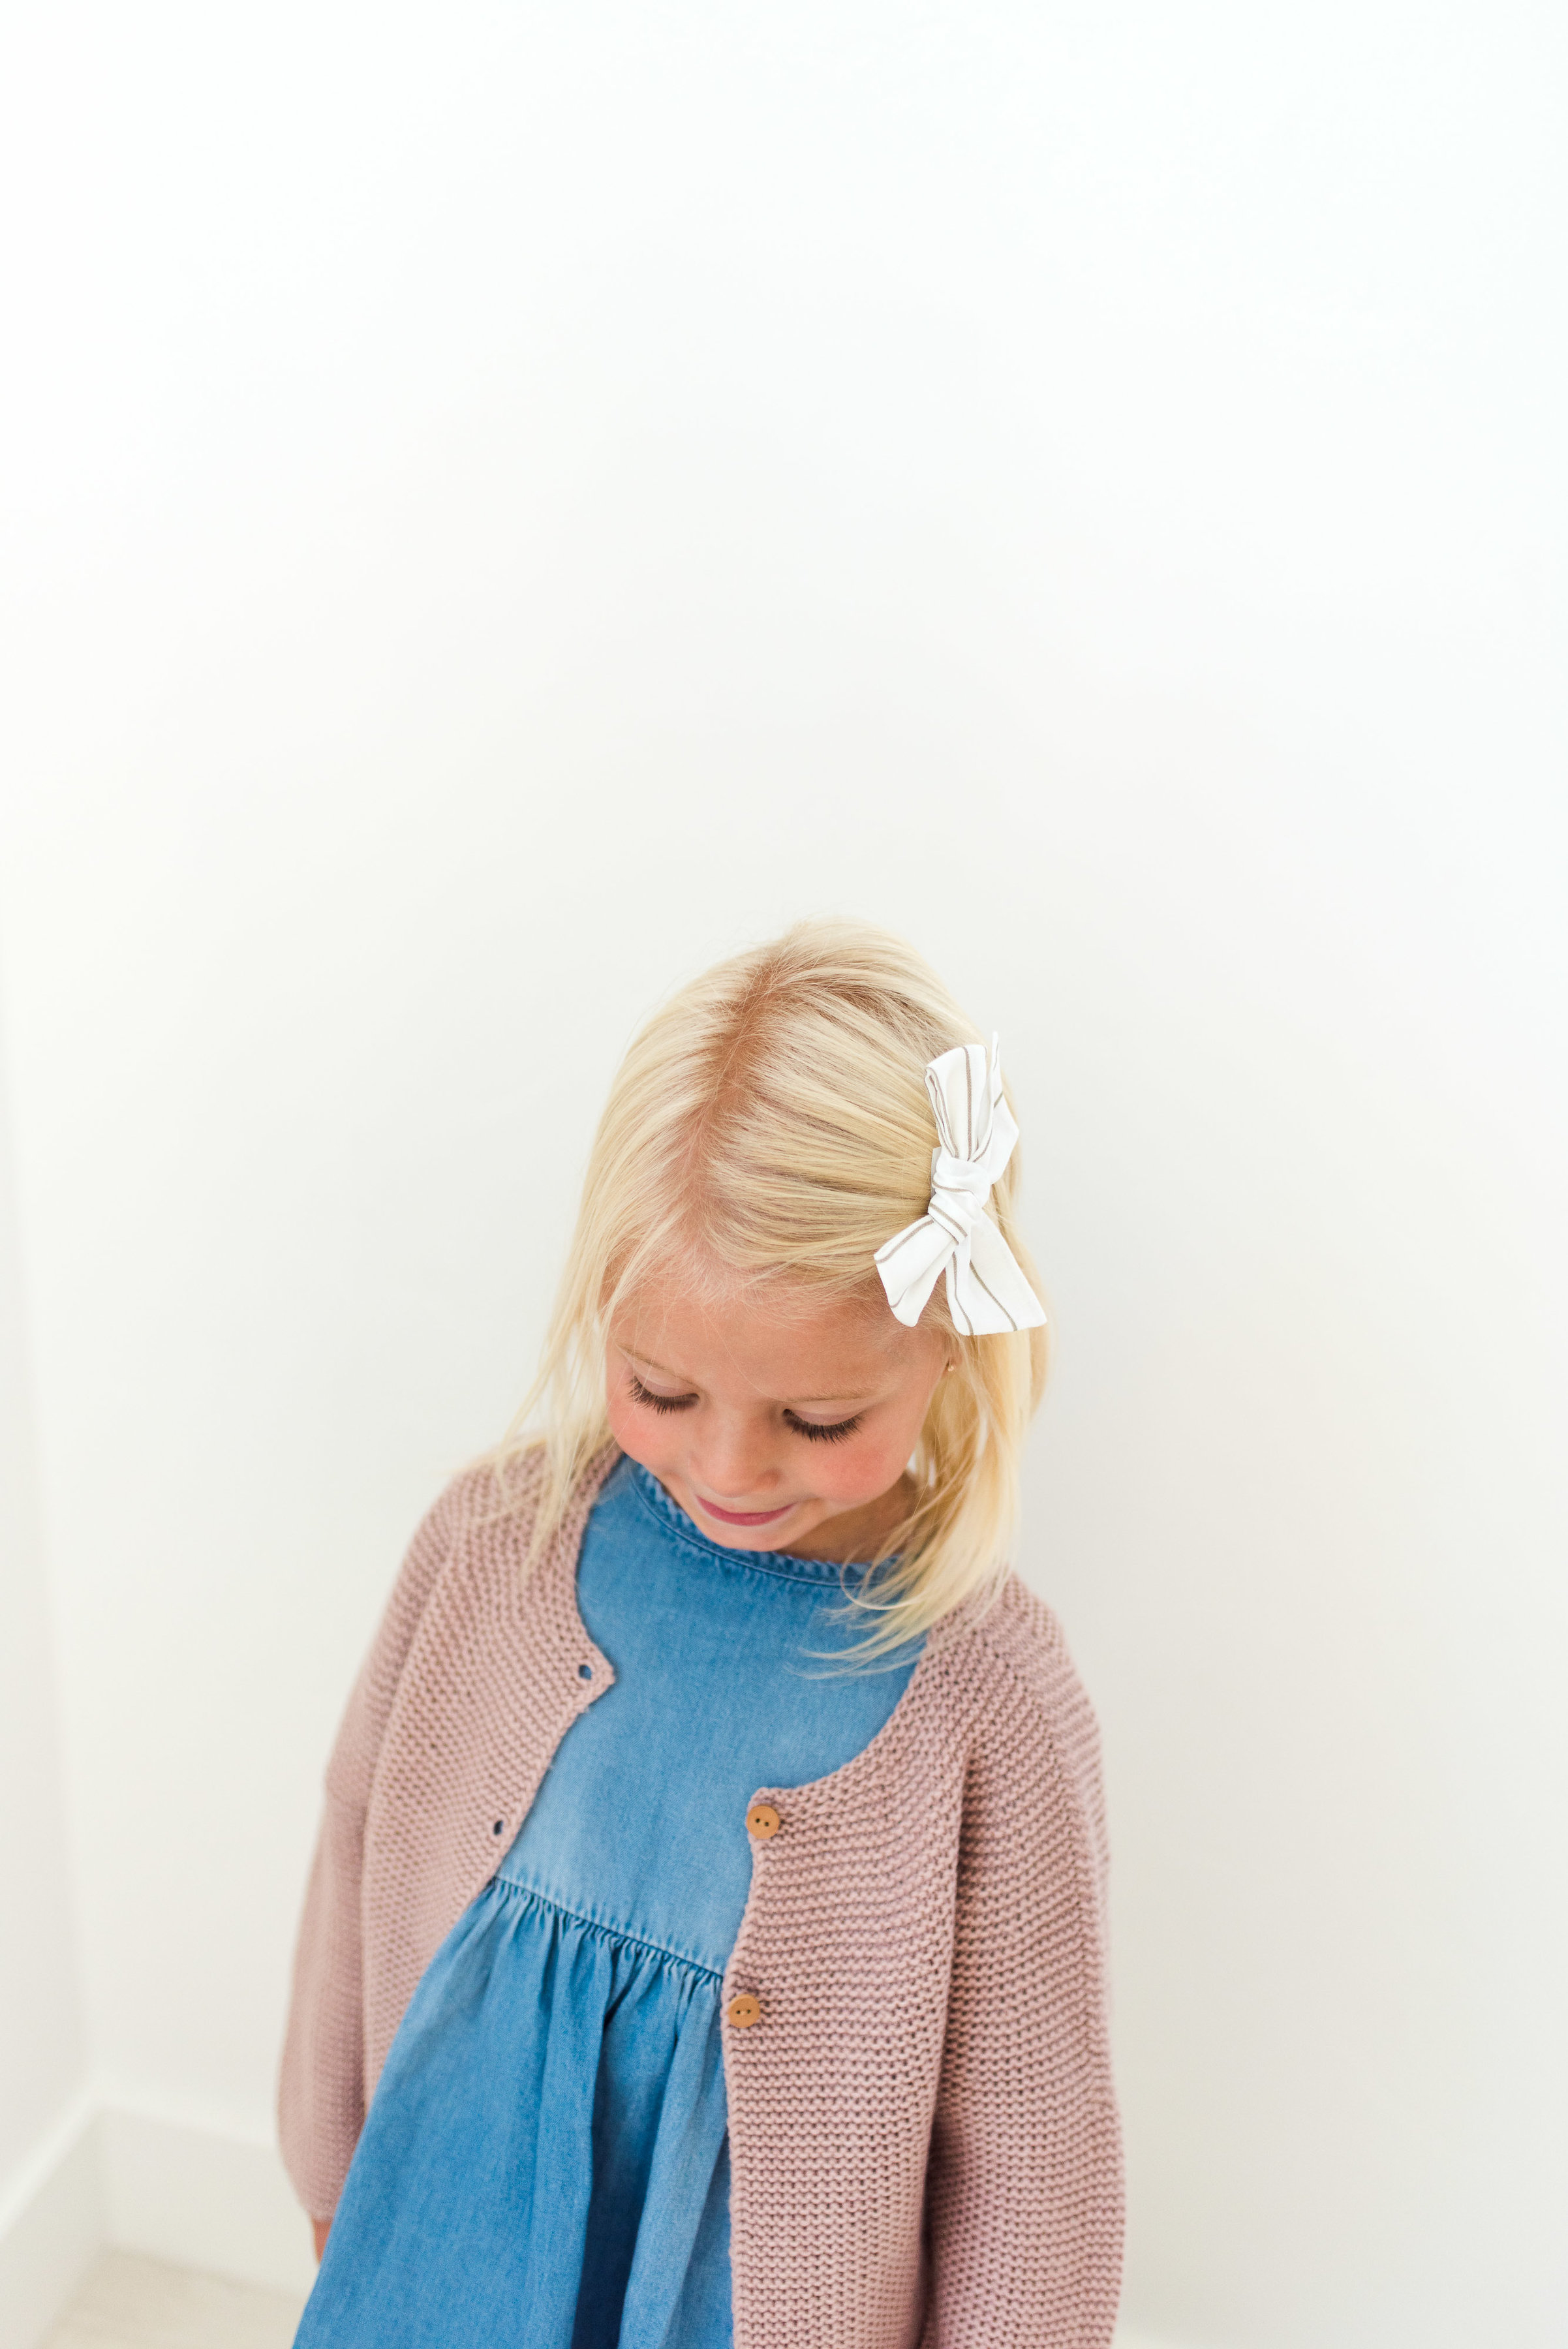 Basic knit cardigan over the flowing denim dress: https://www.zara.com/us/en/kids/baby-girl-%7C-3-months---4-years/sweaters-and-cardigans/basic-knit-cardigan-c269277p4620550.html